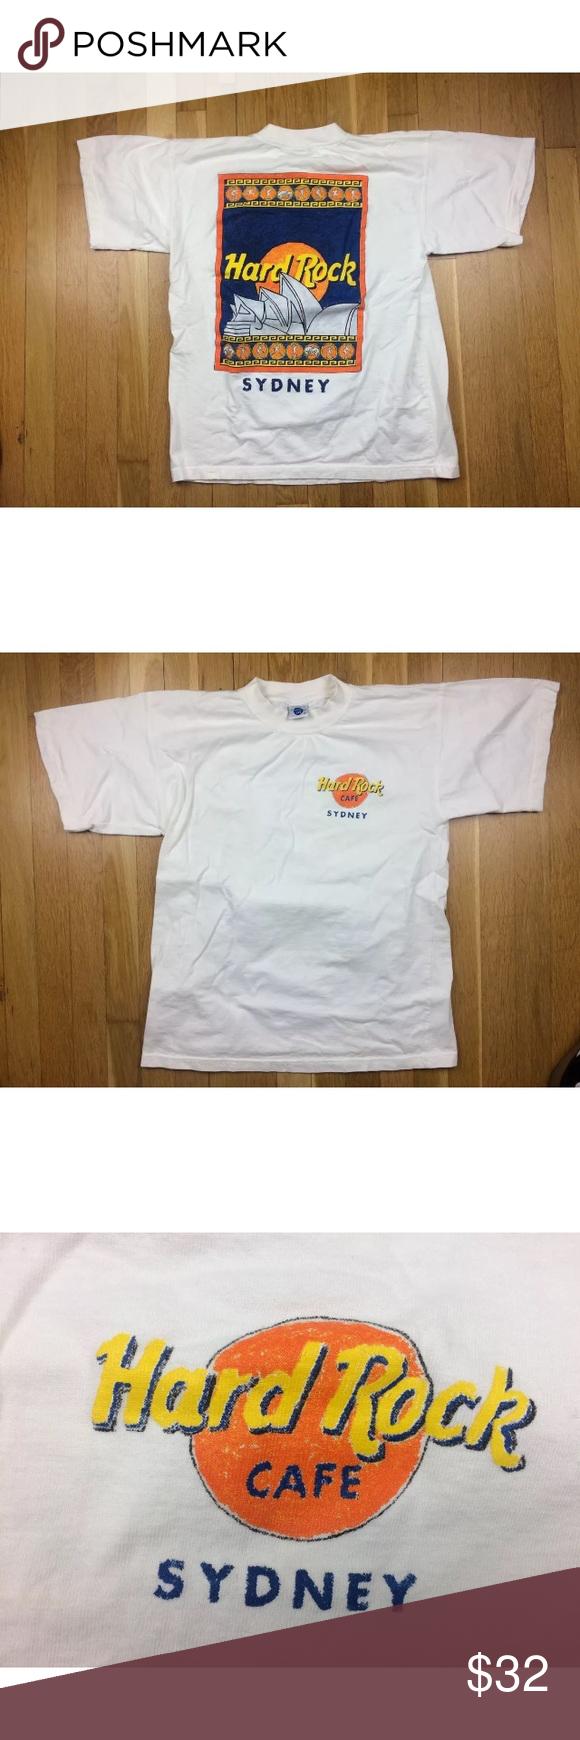 T-Shirt Manica Lunga da Neonato per Neonato Babies Rock Onesie Unisex Bodysuits Cloth